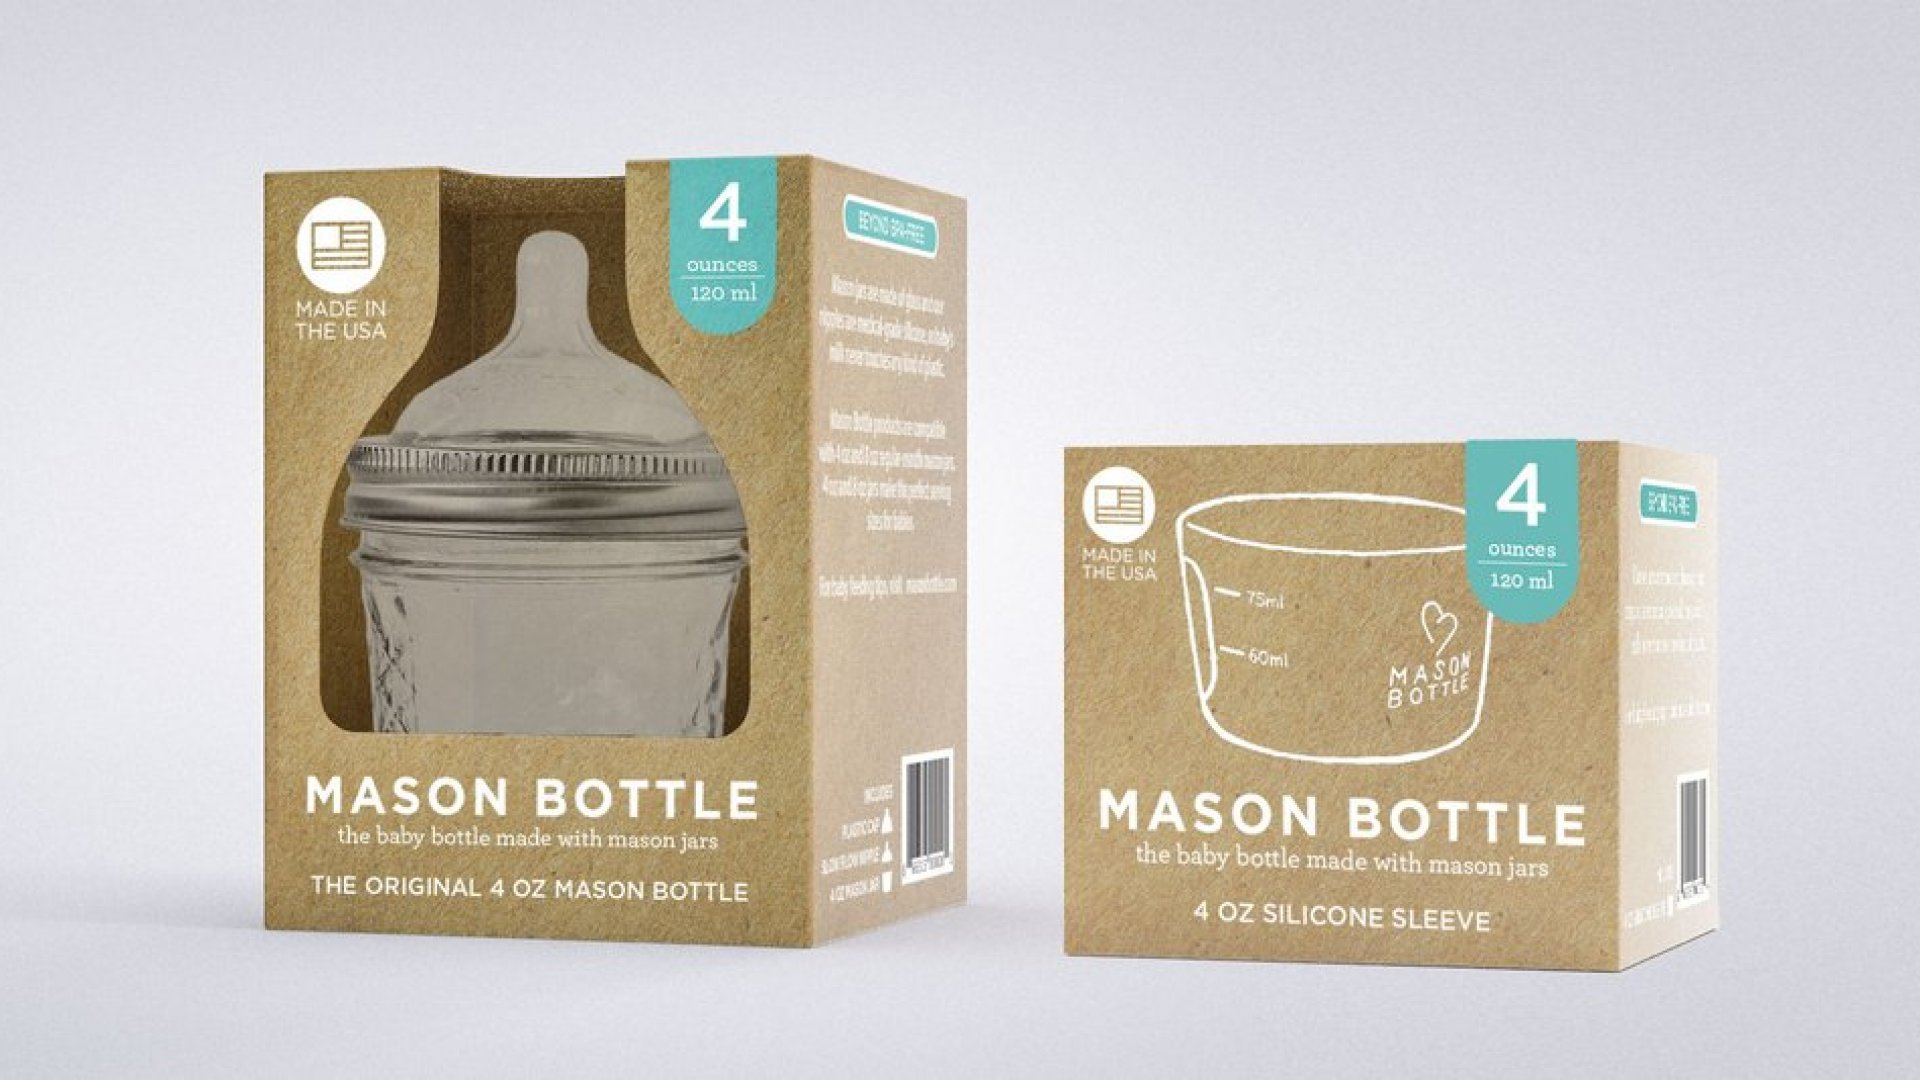 A Mason Bottle